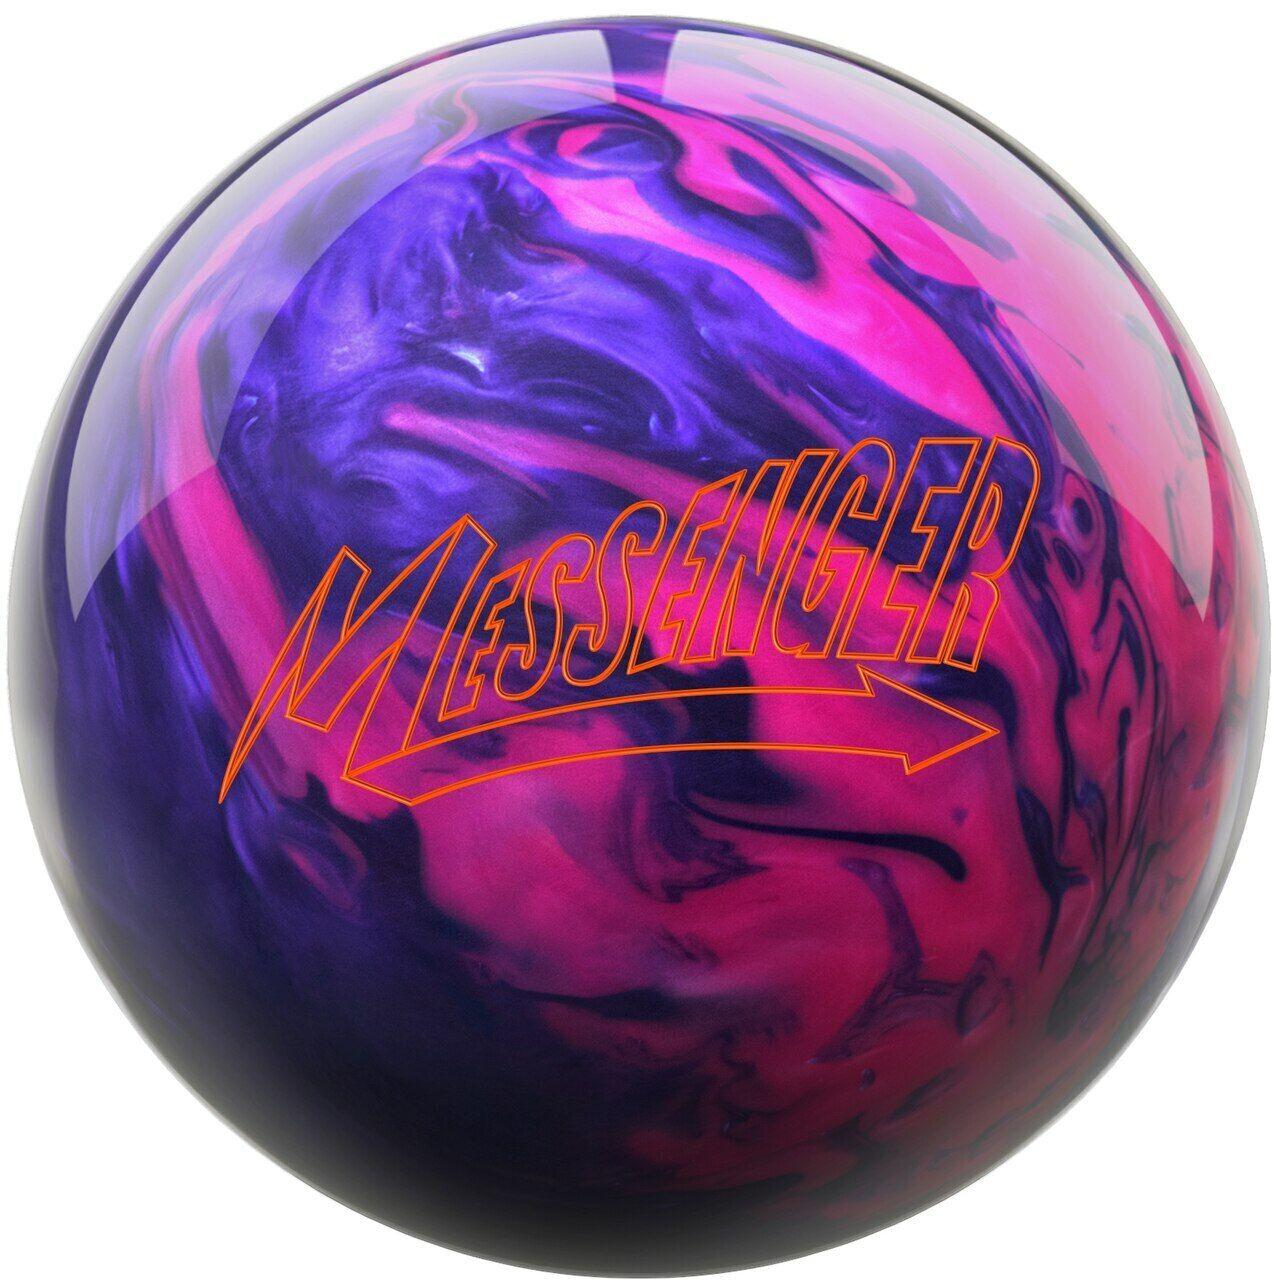 Columbia 300 Messenger Bowling Ball Black Gold NIB 1st Quality